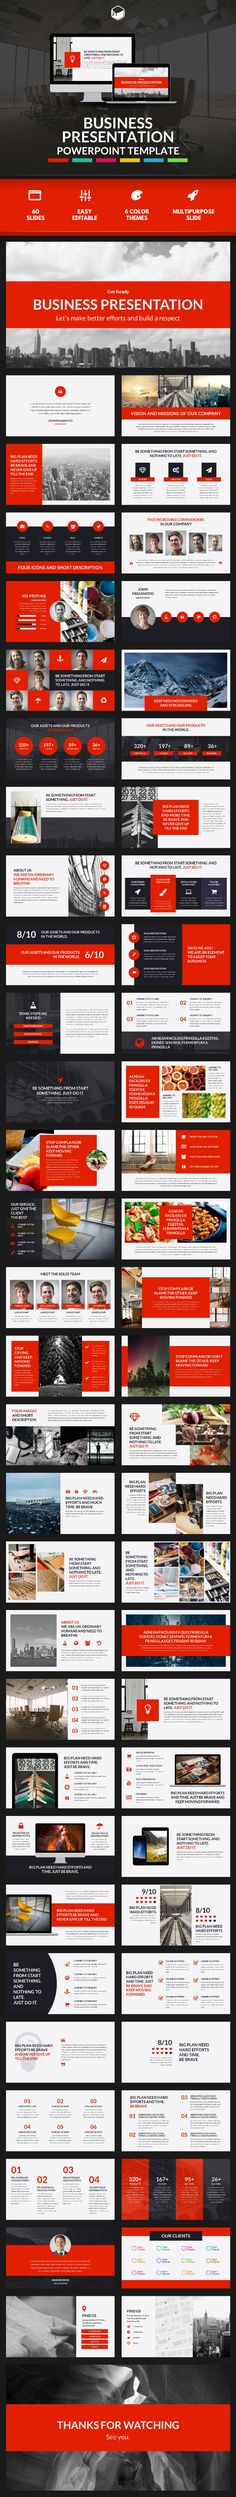 Business Presentation 2 - PowerPoint Template